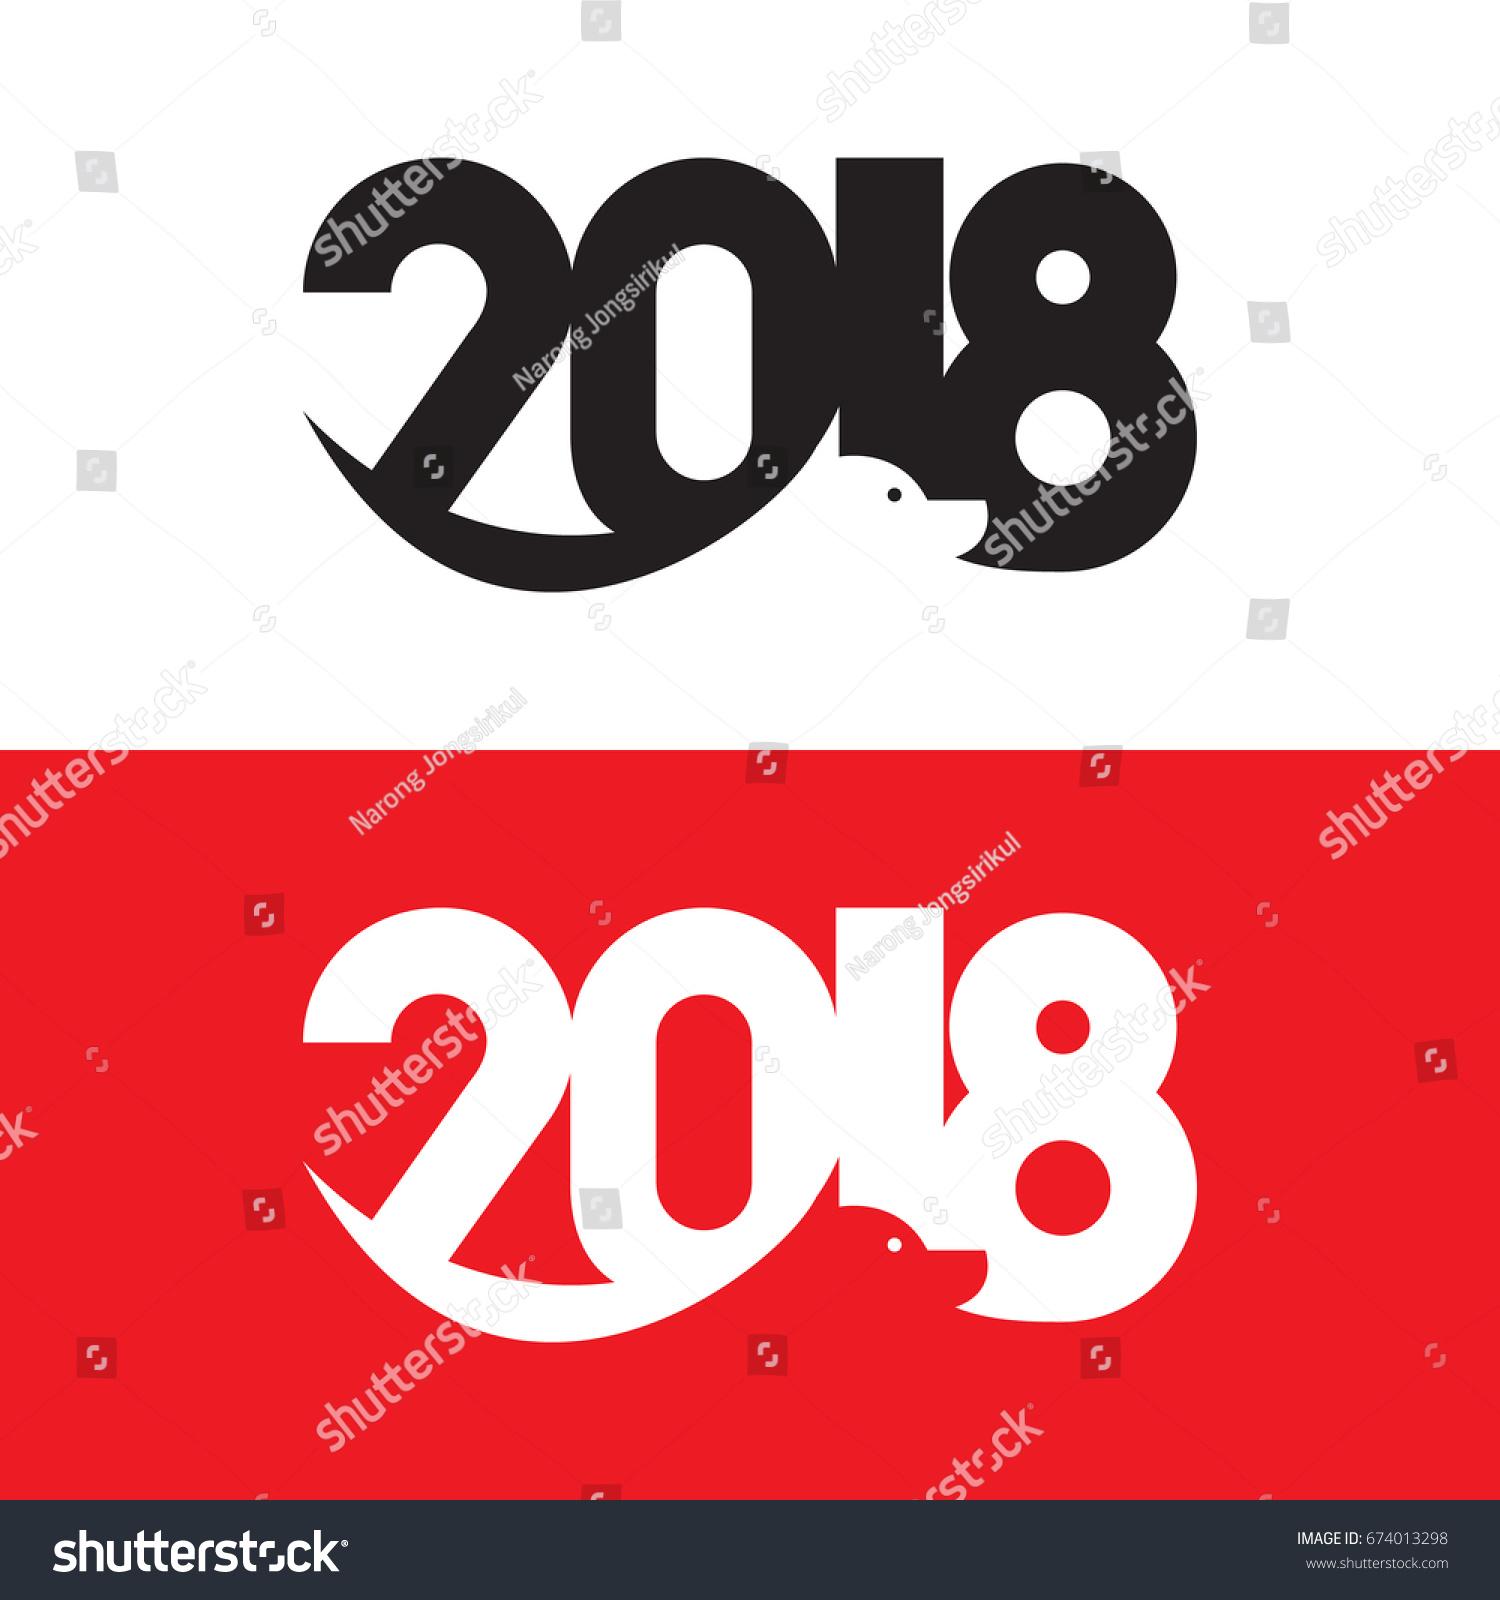 chinese new year year dog 2018 stock vector 2018 674013298 rh shutterstock com